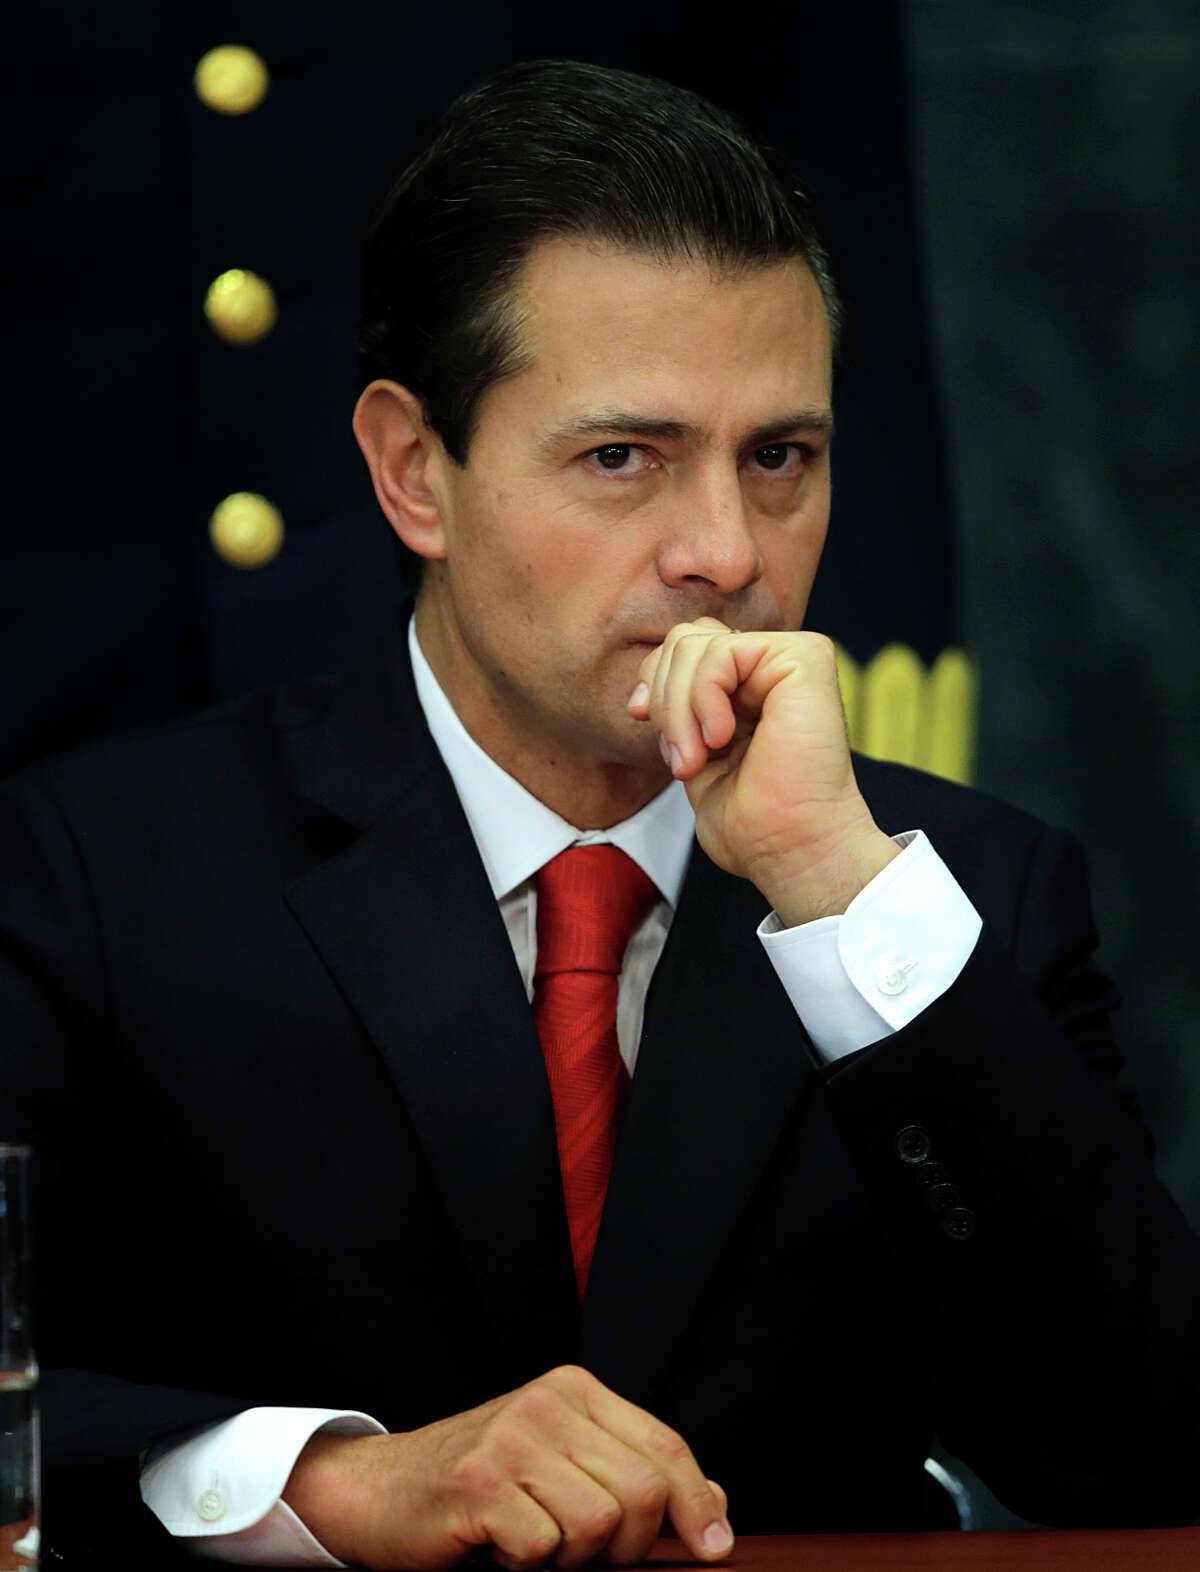 Mexico's President Enrique Peña Nieto says